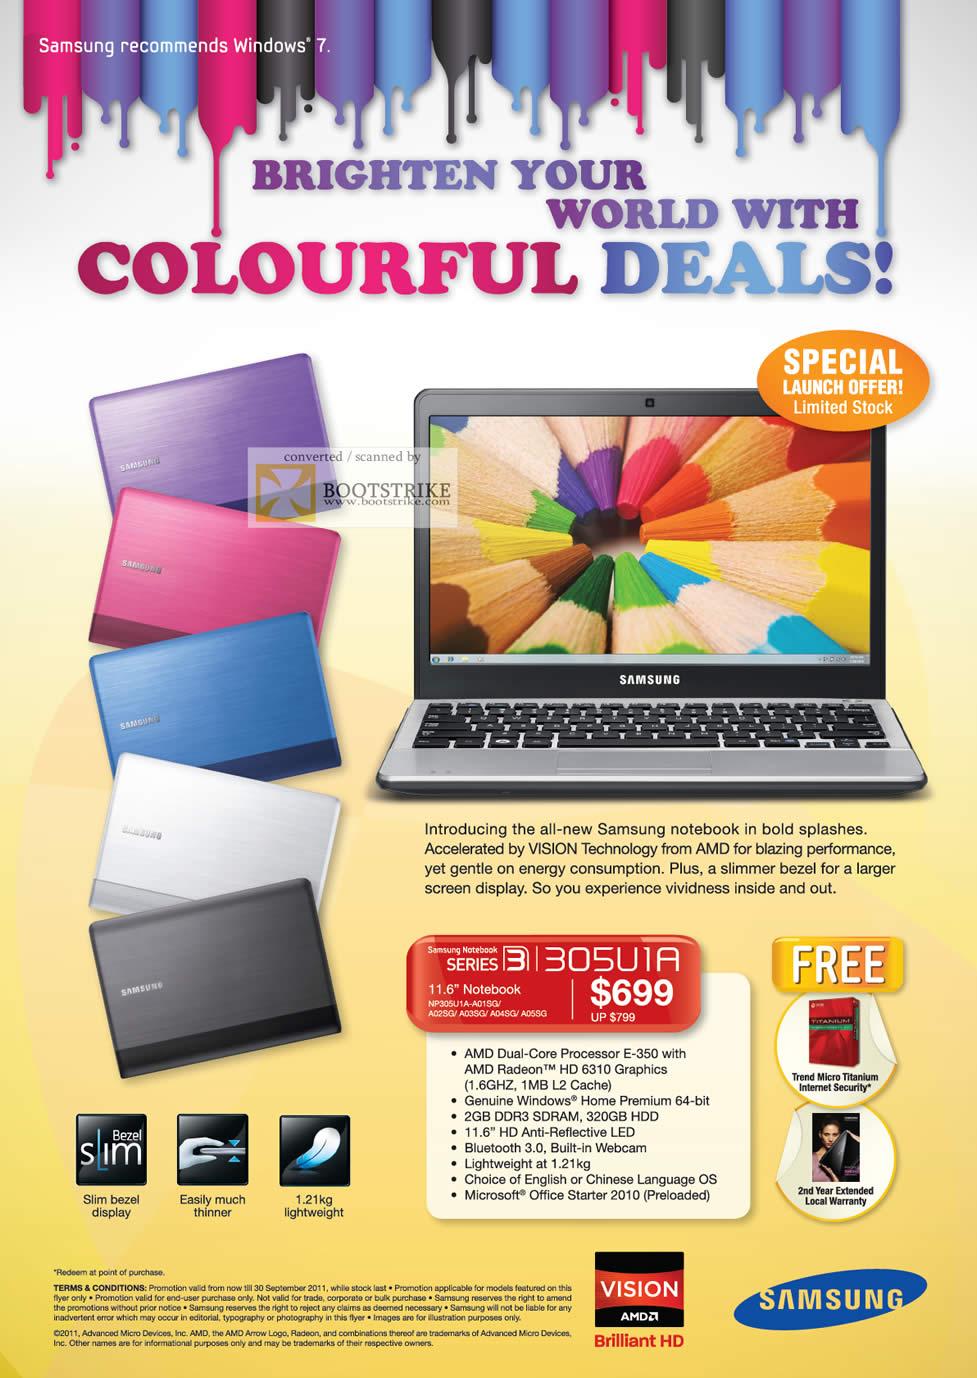 COMEX 2011 price list image brochure of Samsung Notebook Series 3 AMD 305V1A NP305U1A-A01SG A02Sg A03SG A04SG A05SG